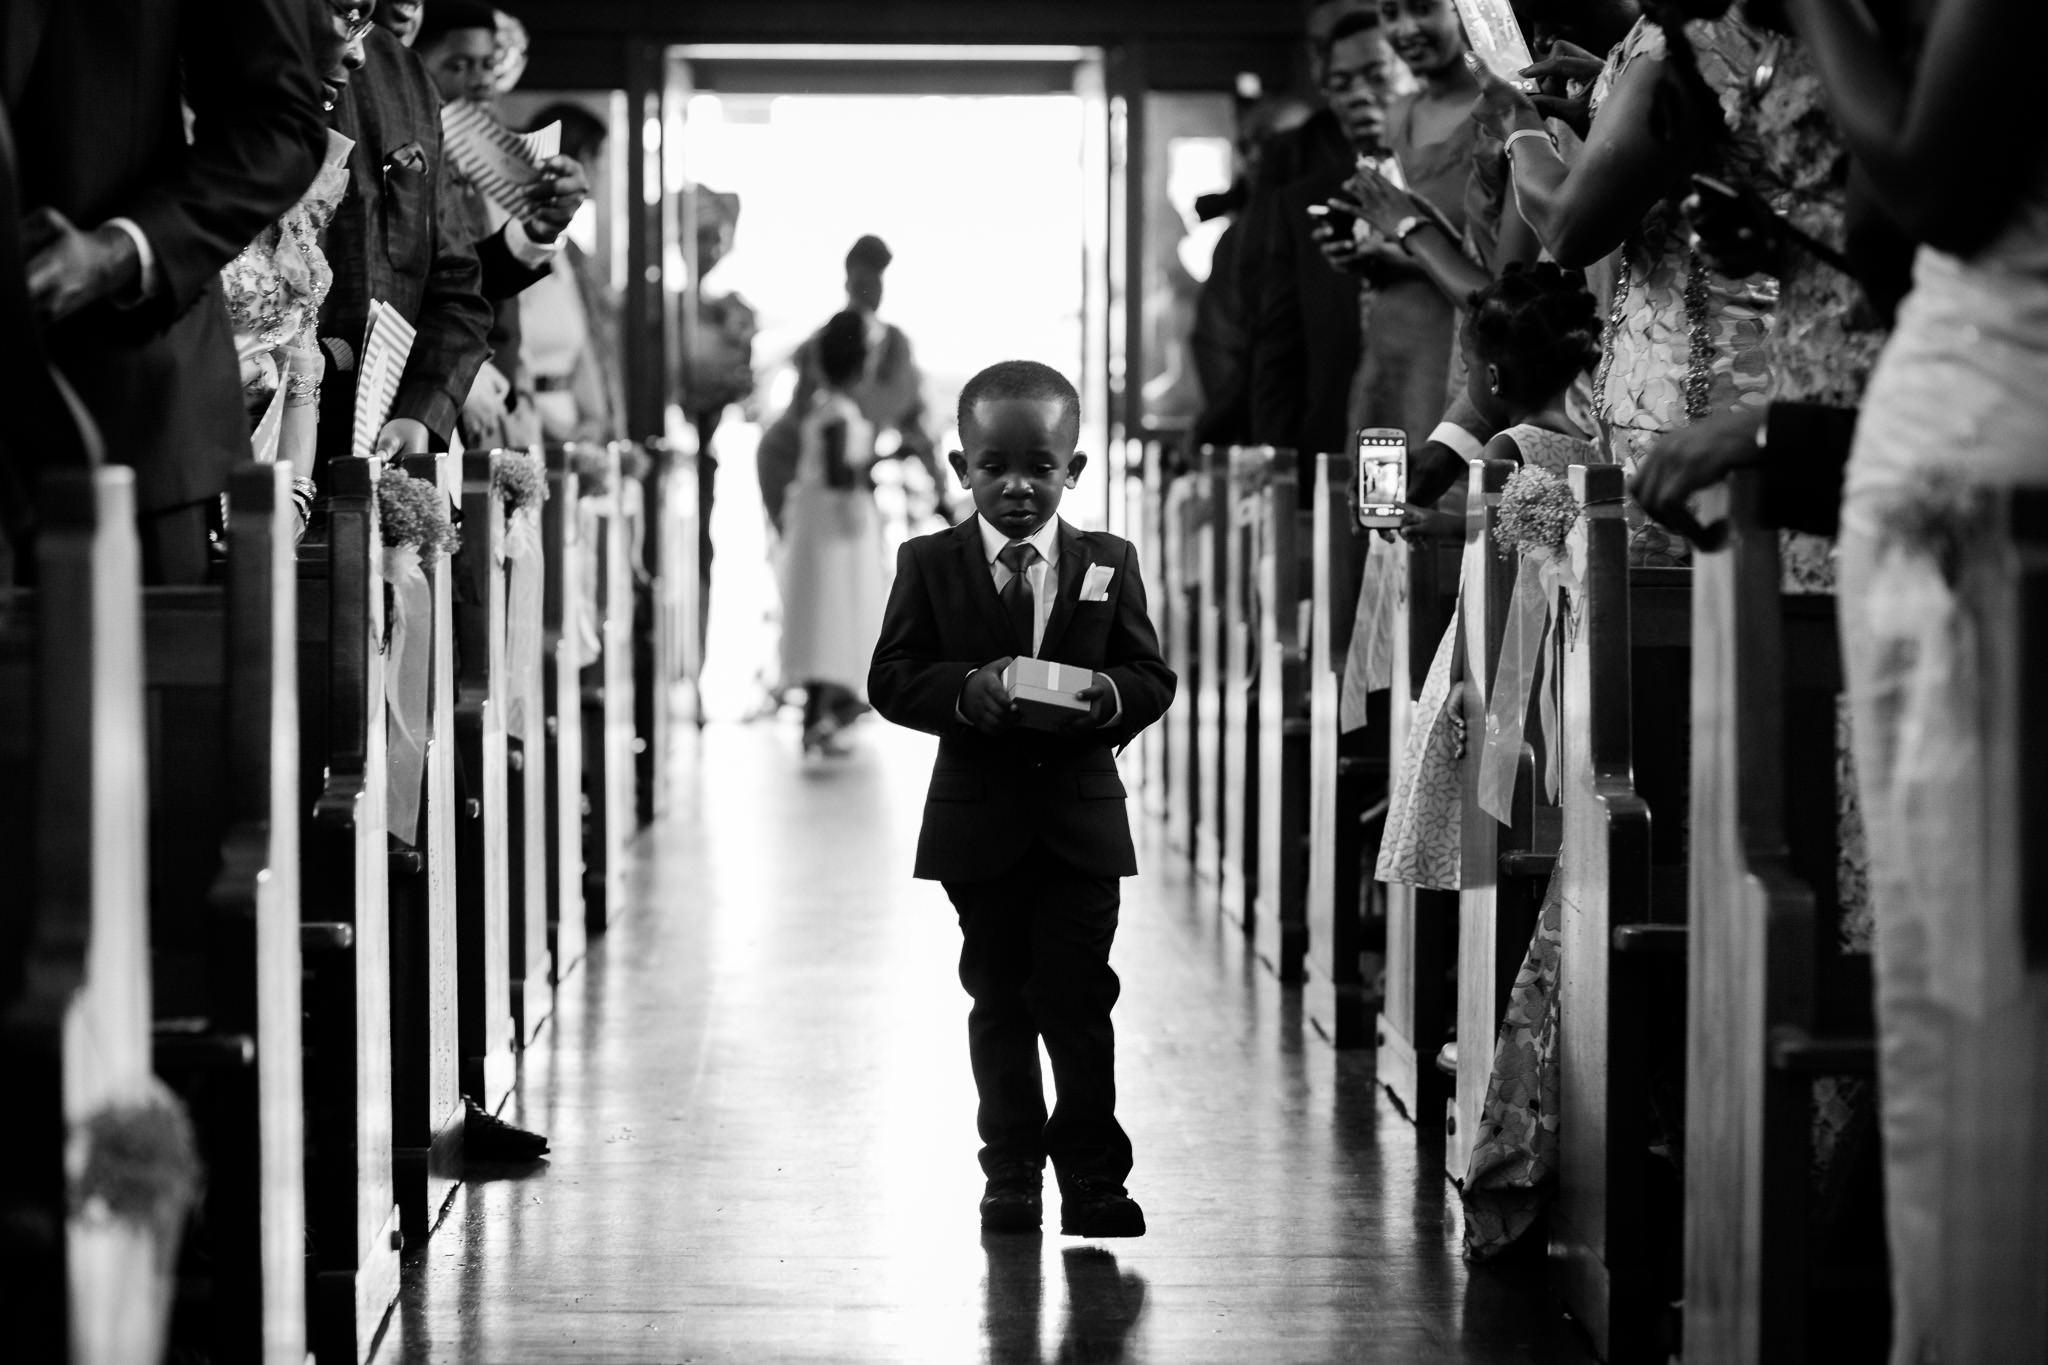 Addington Palace wedding pageboy walking down the aisle